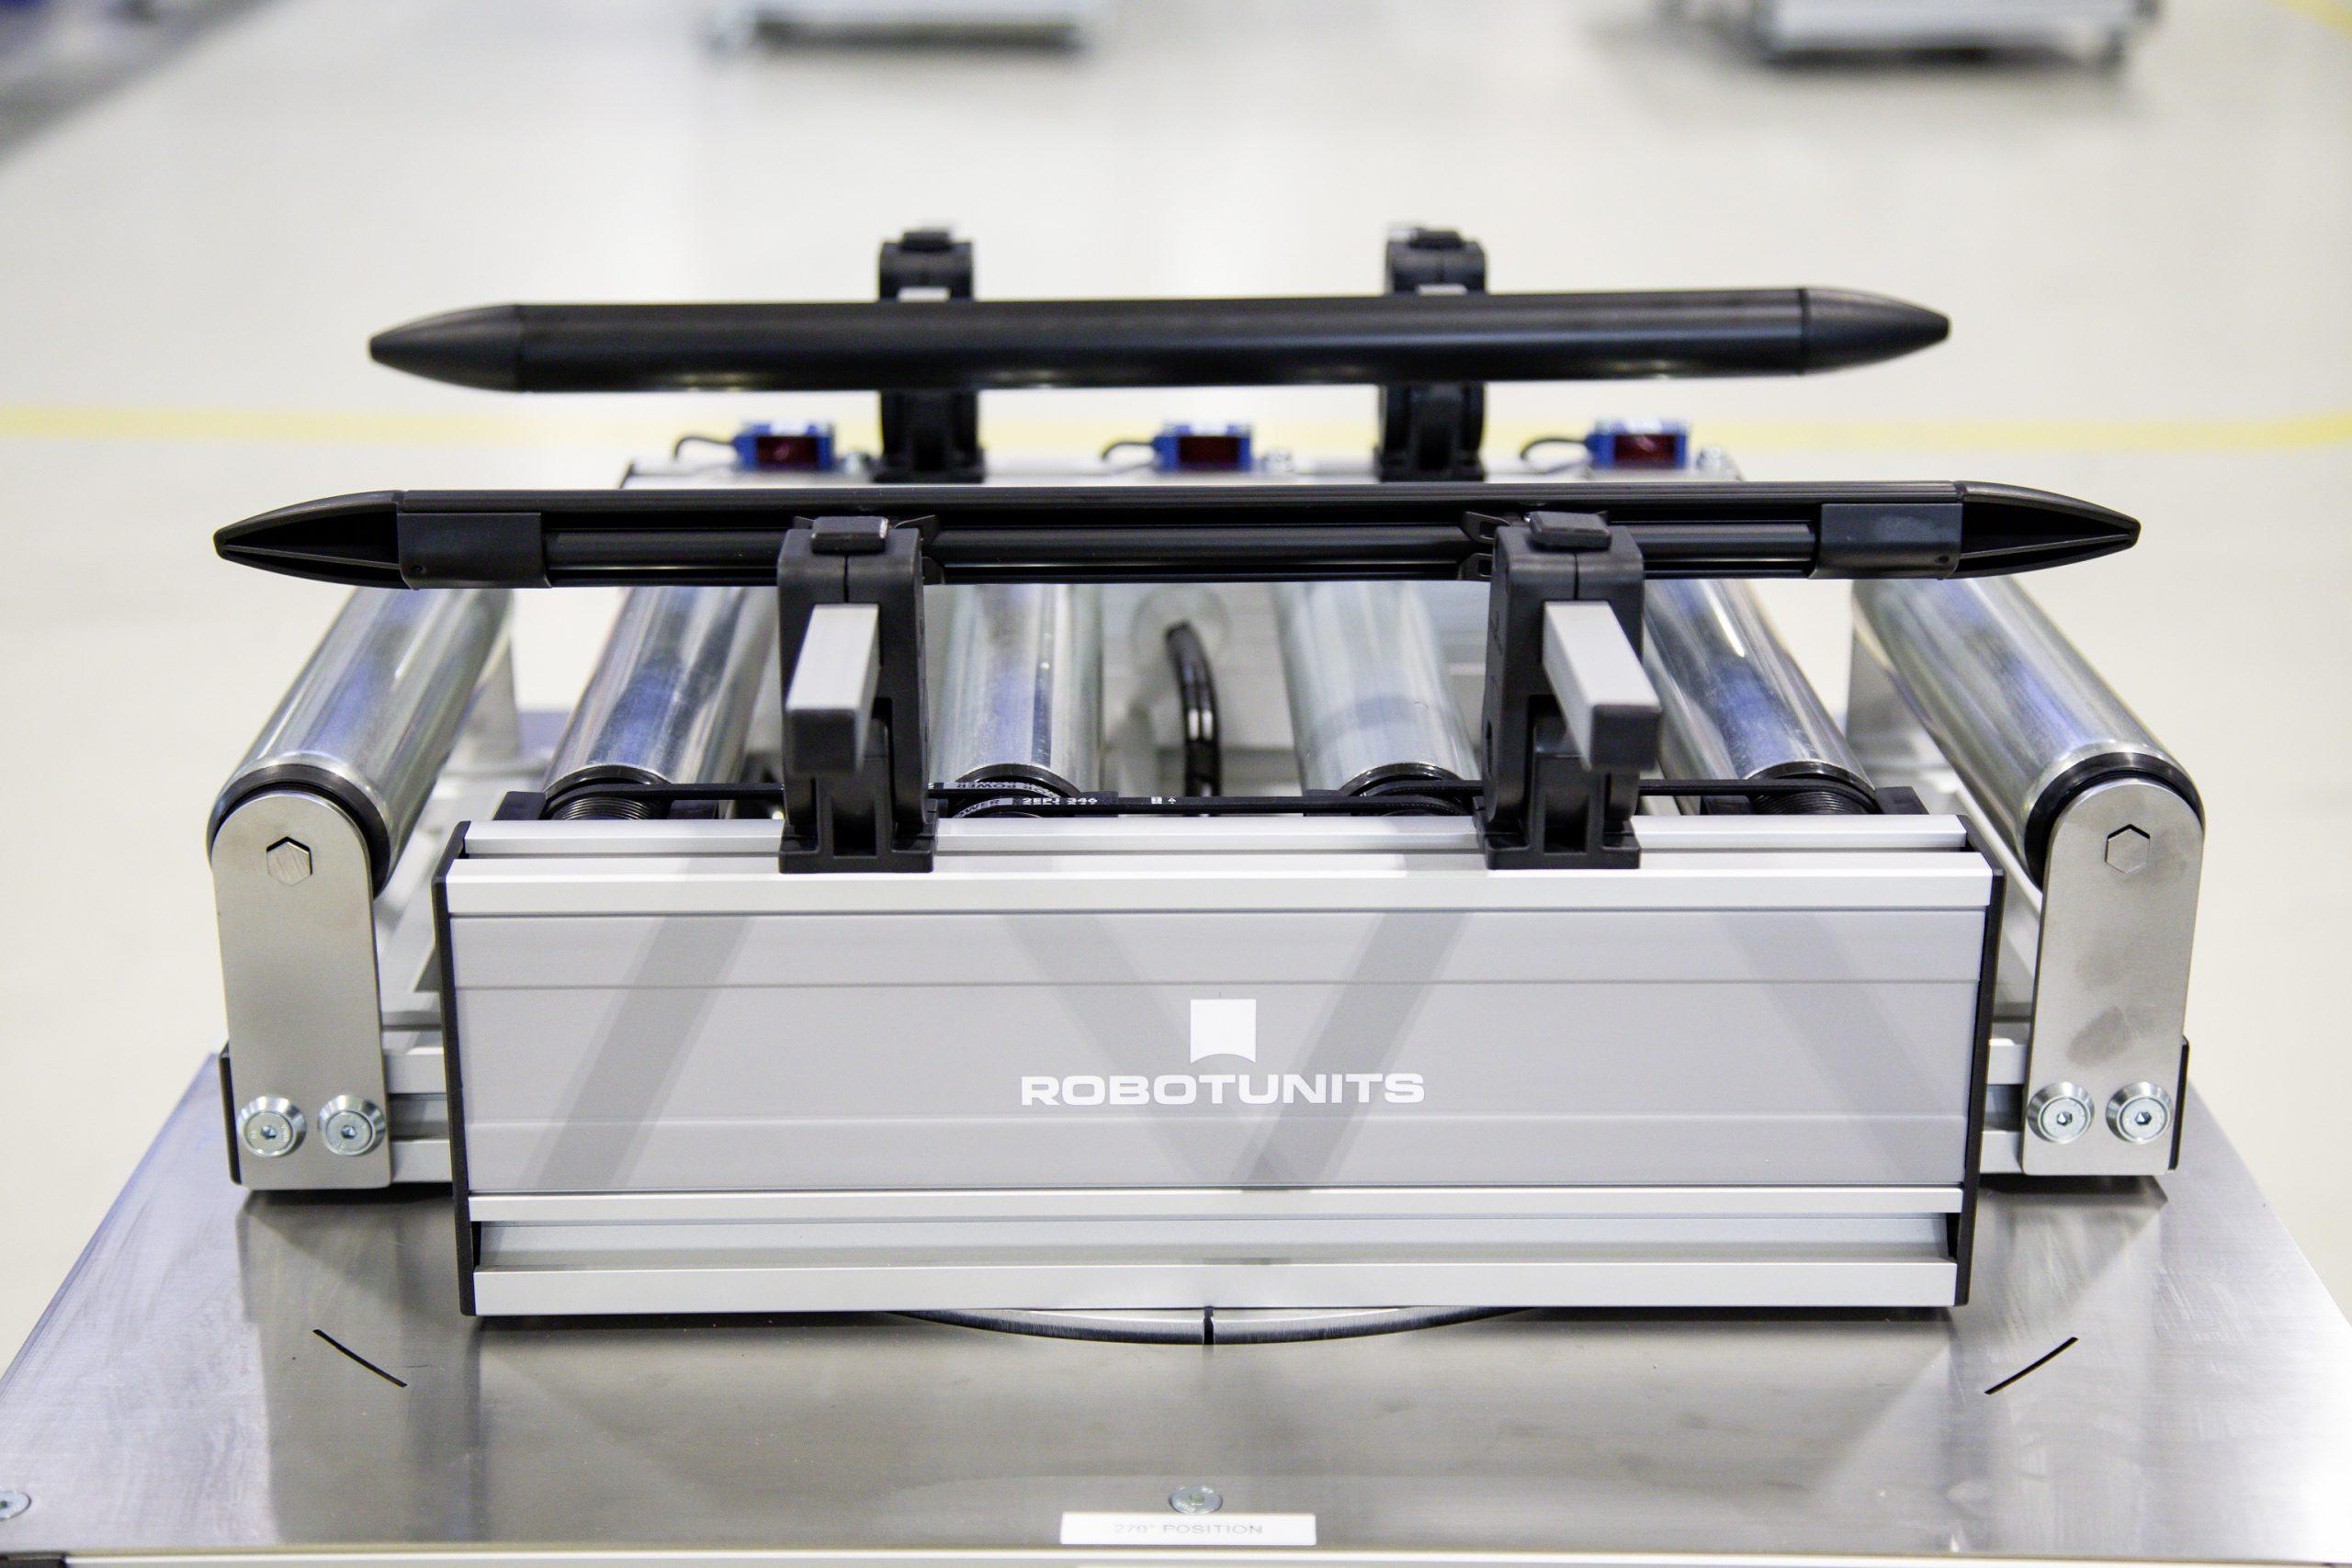 (Bild: Robotunits GmbH GmbH)